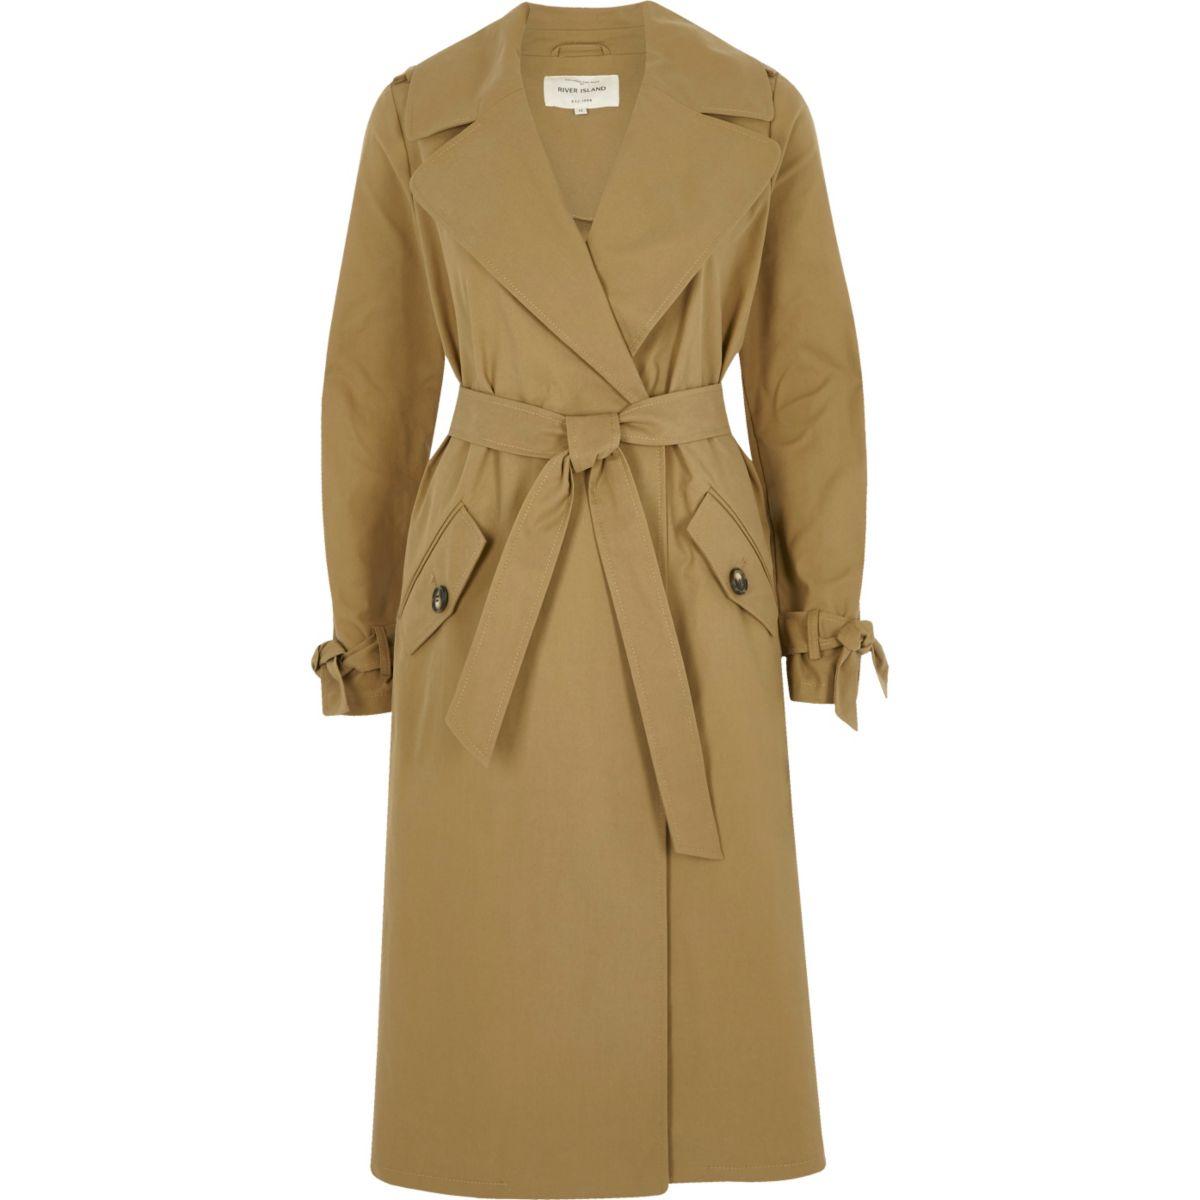 Dark beige classic trench coat